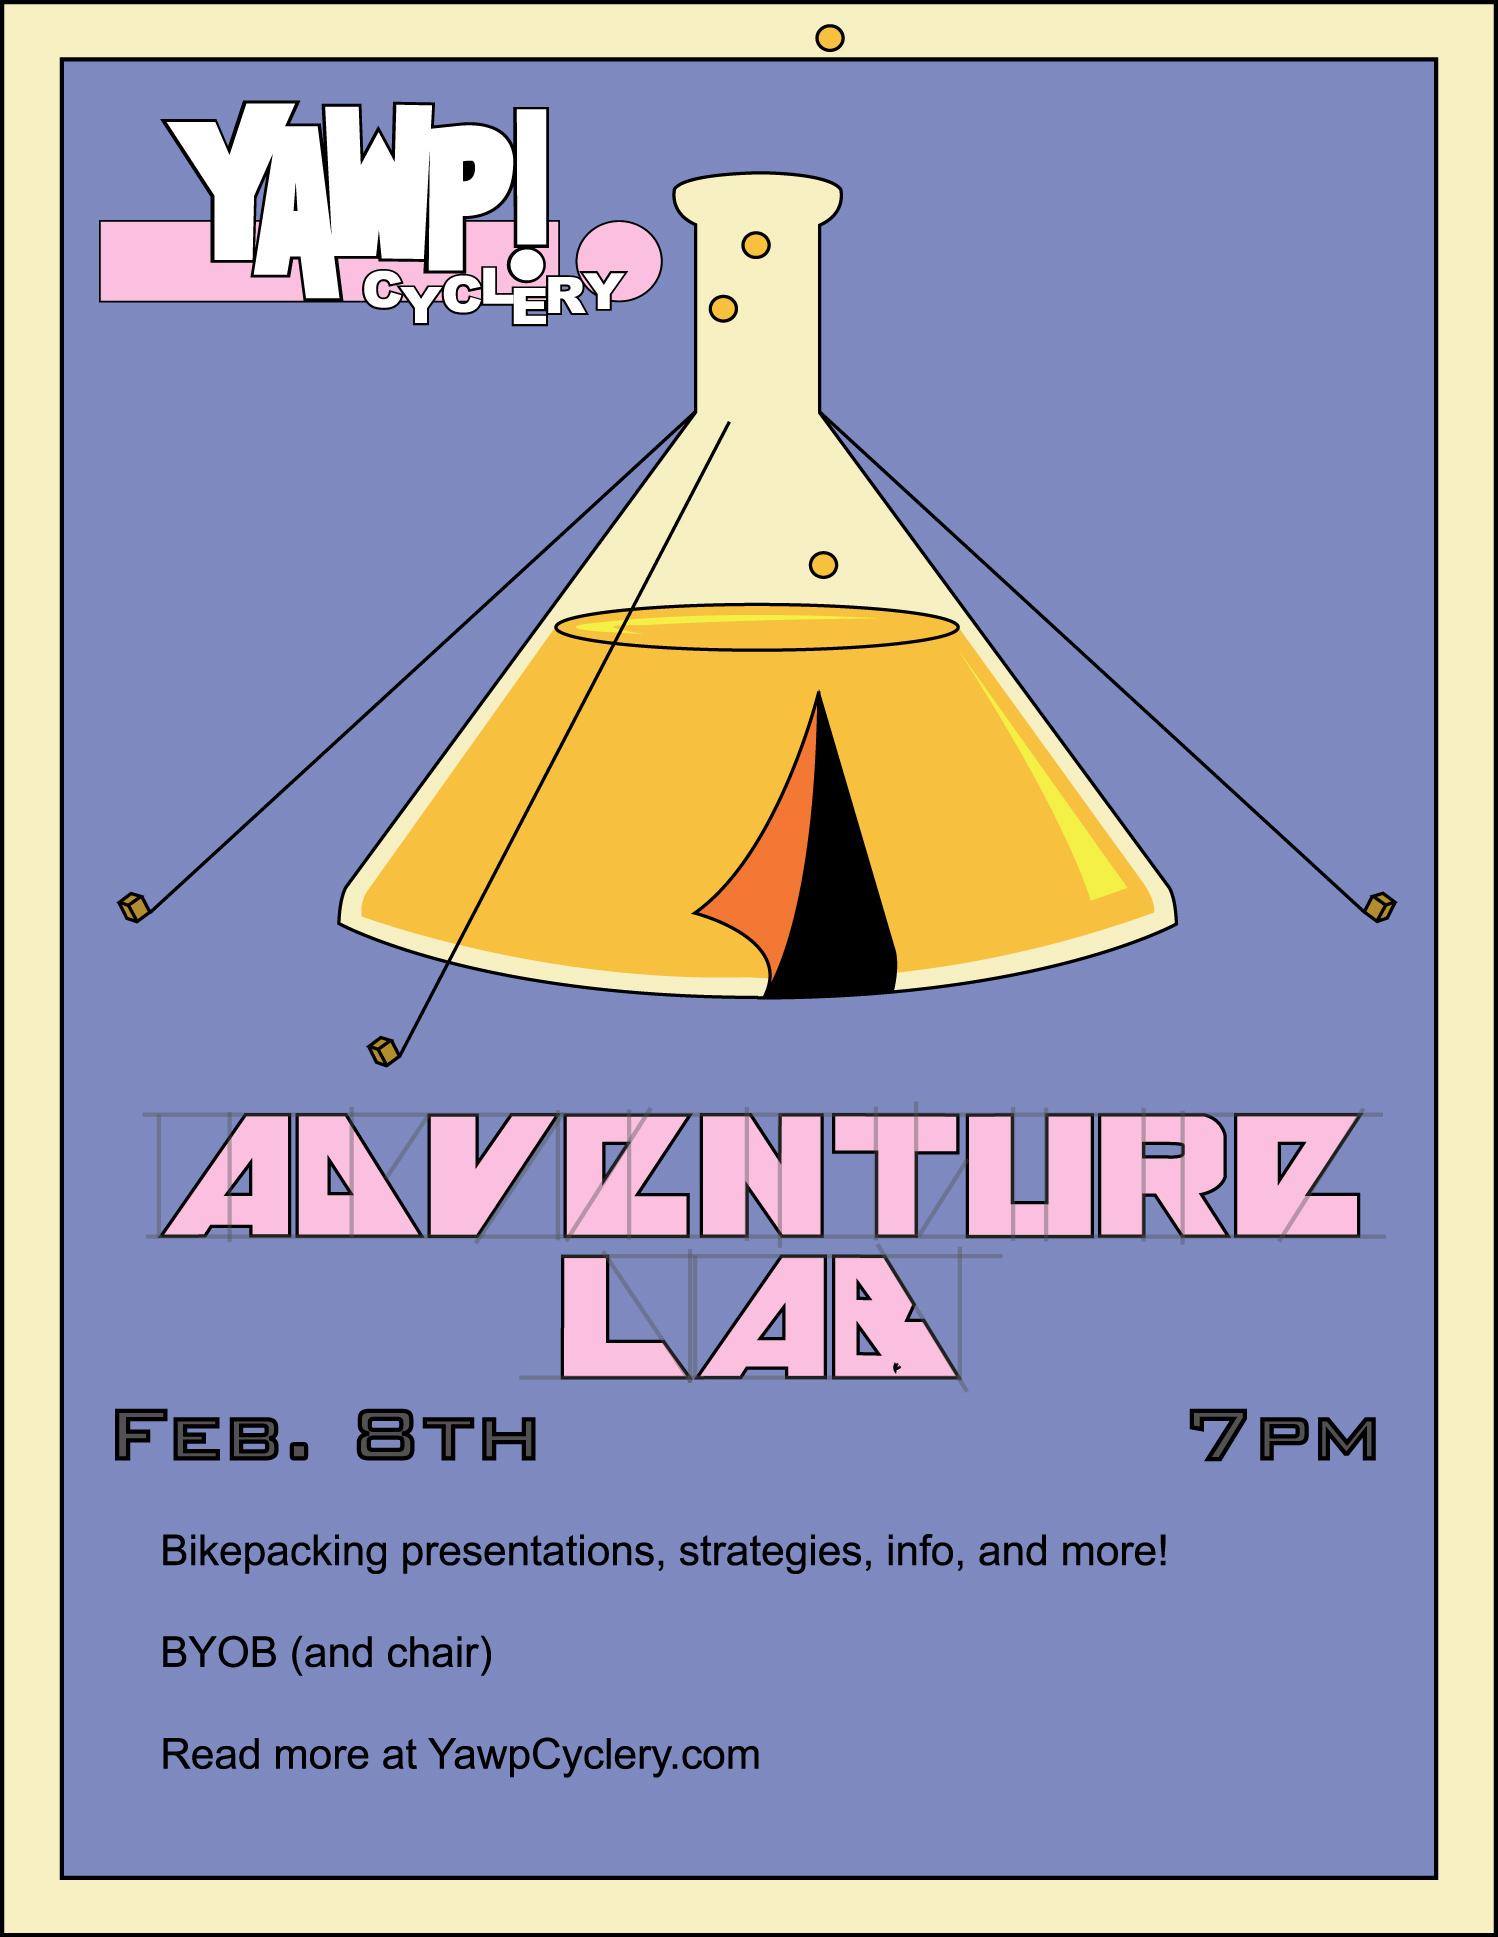 Adventure Lab Flyer 2018.jpg